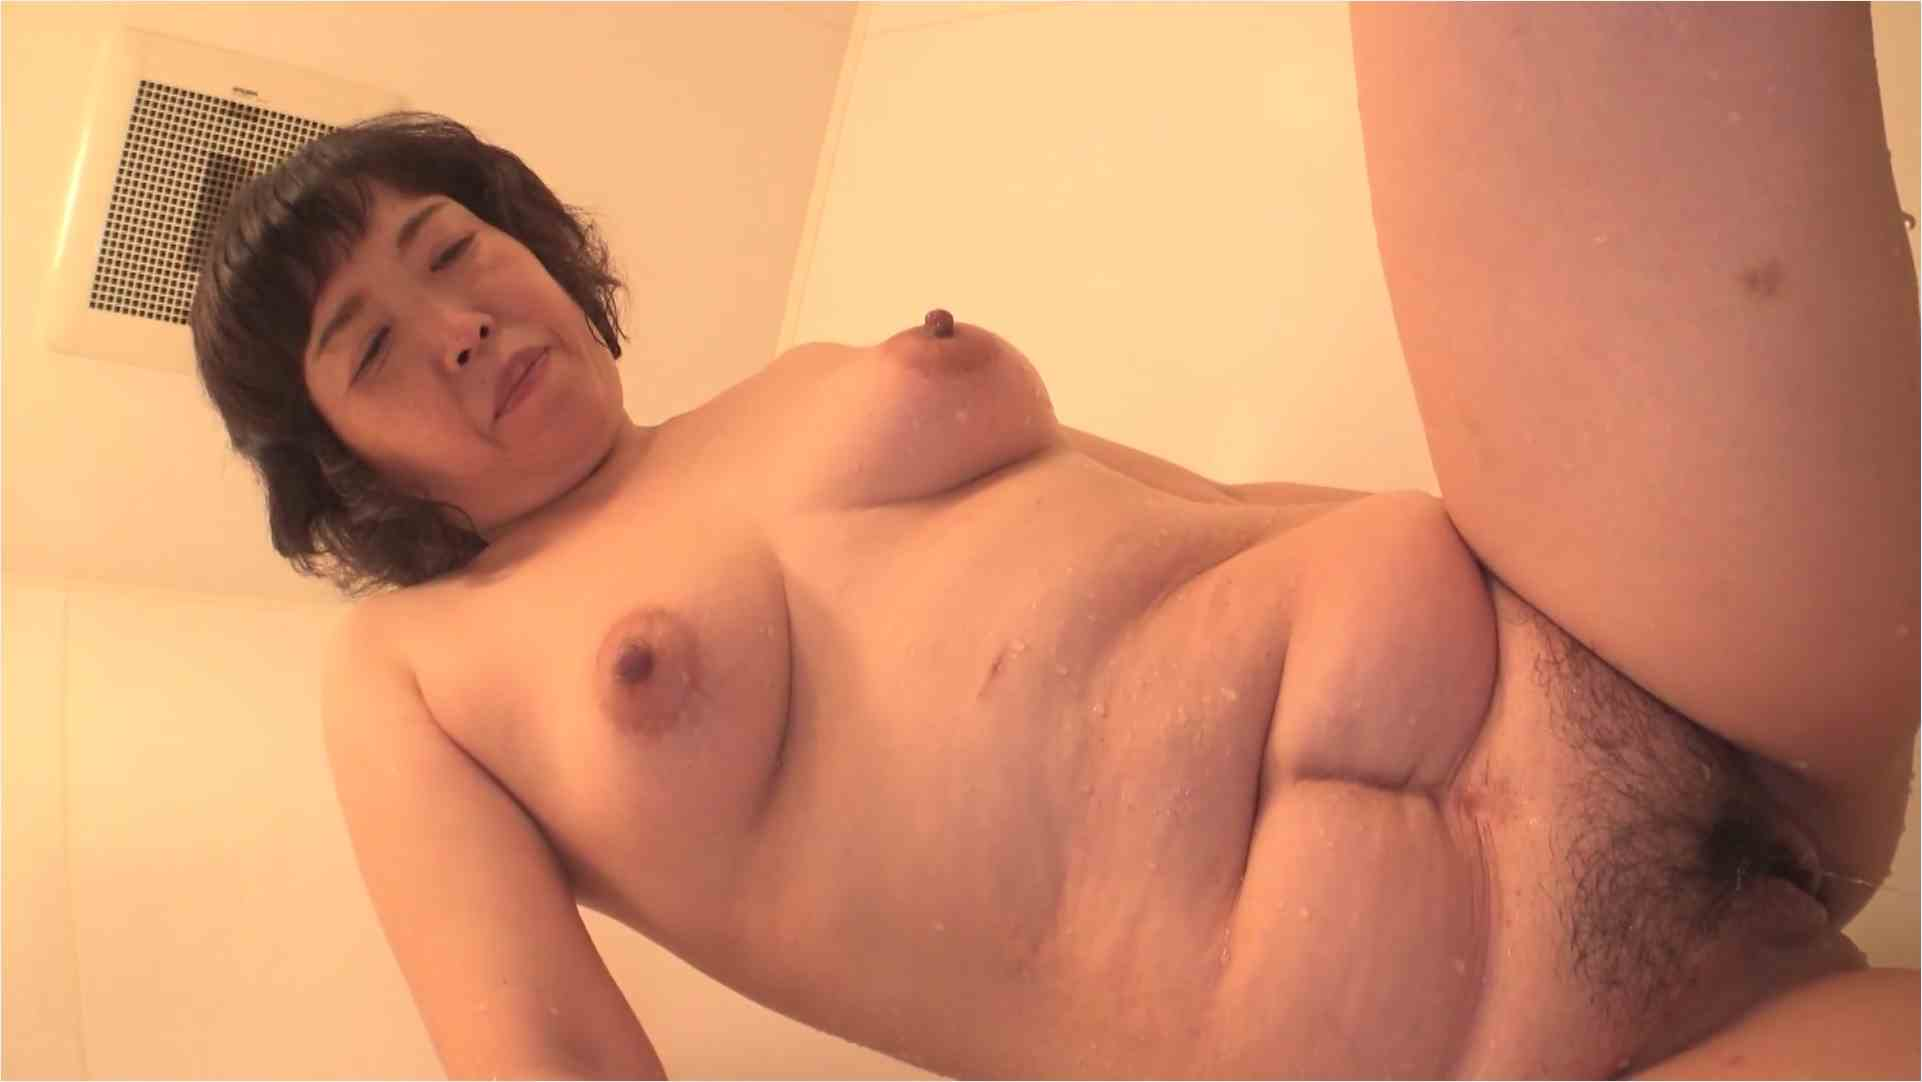 Pacopacomama-030719_045-人妻自宅ハメ ~ベテラン看護師の実生活~ 小島みまき